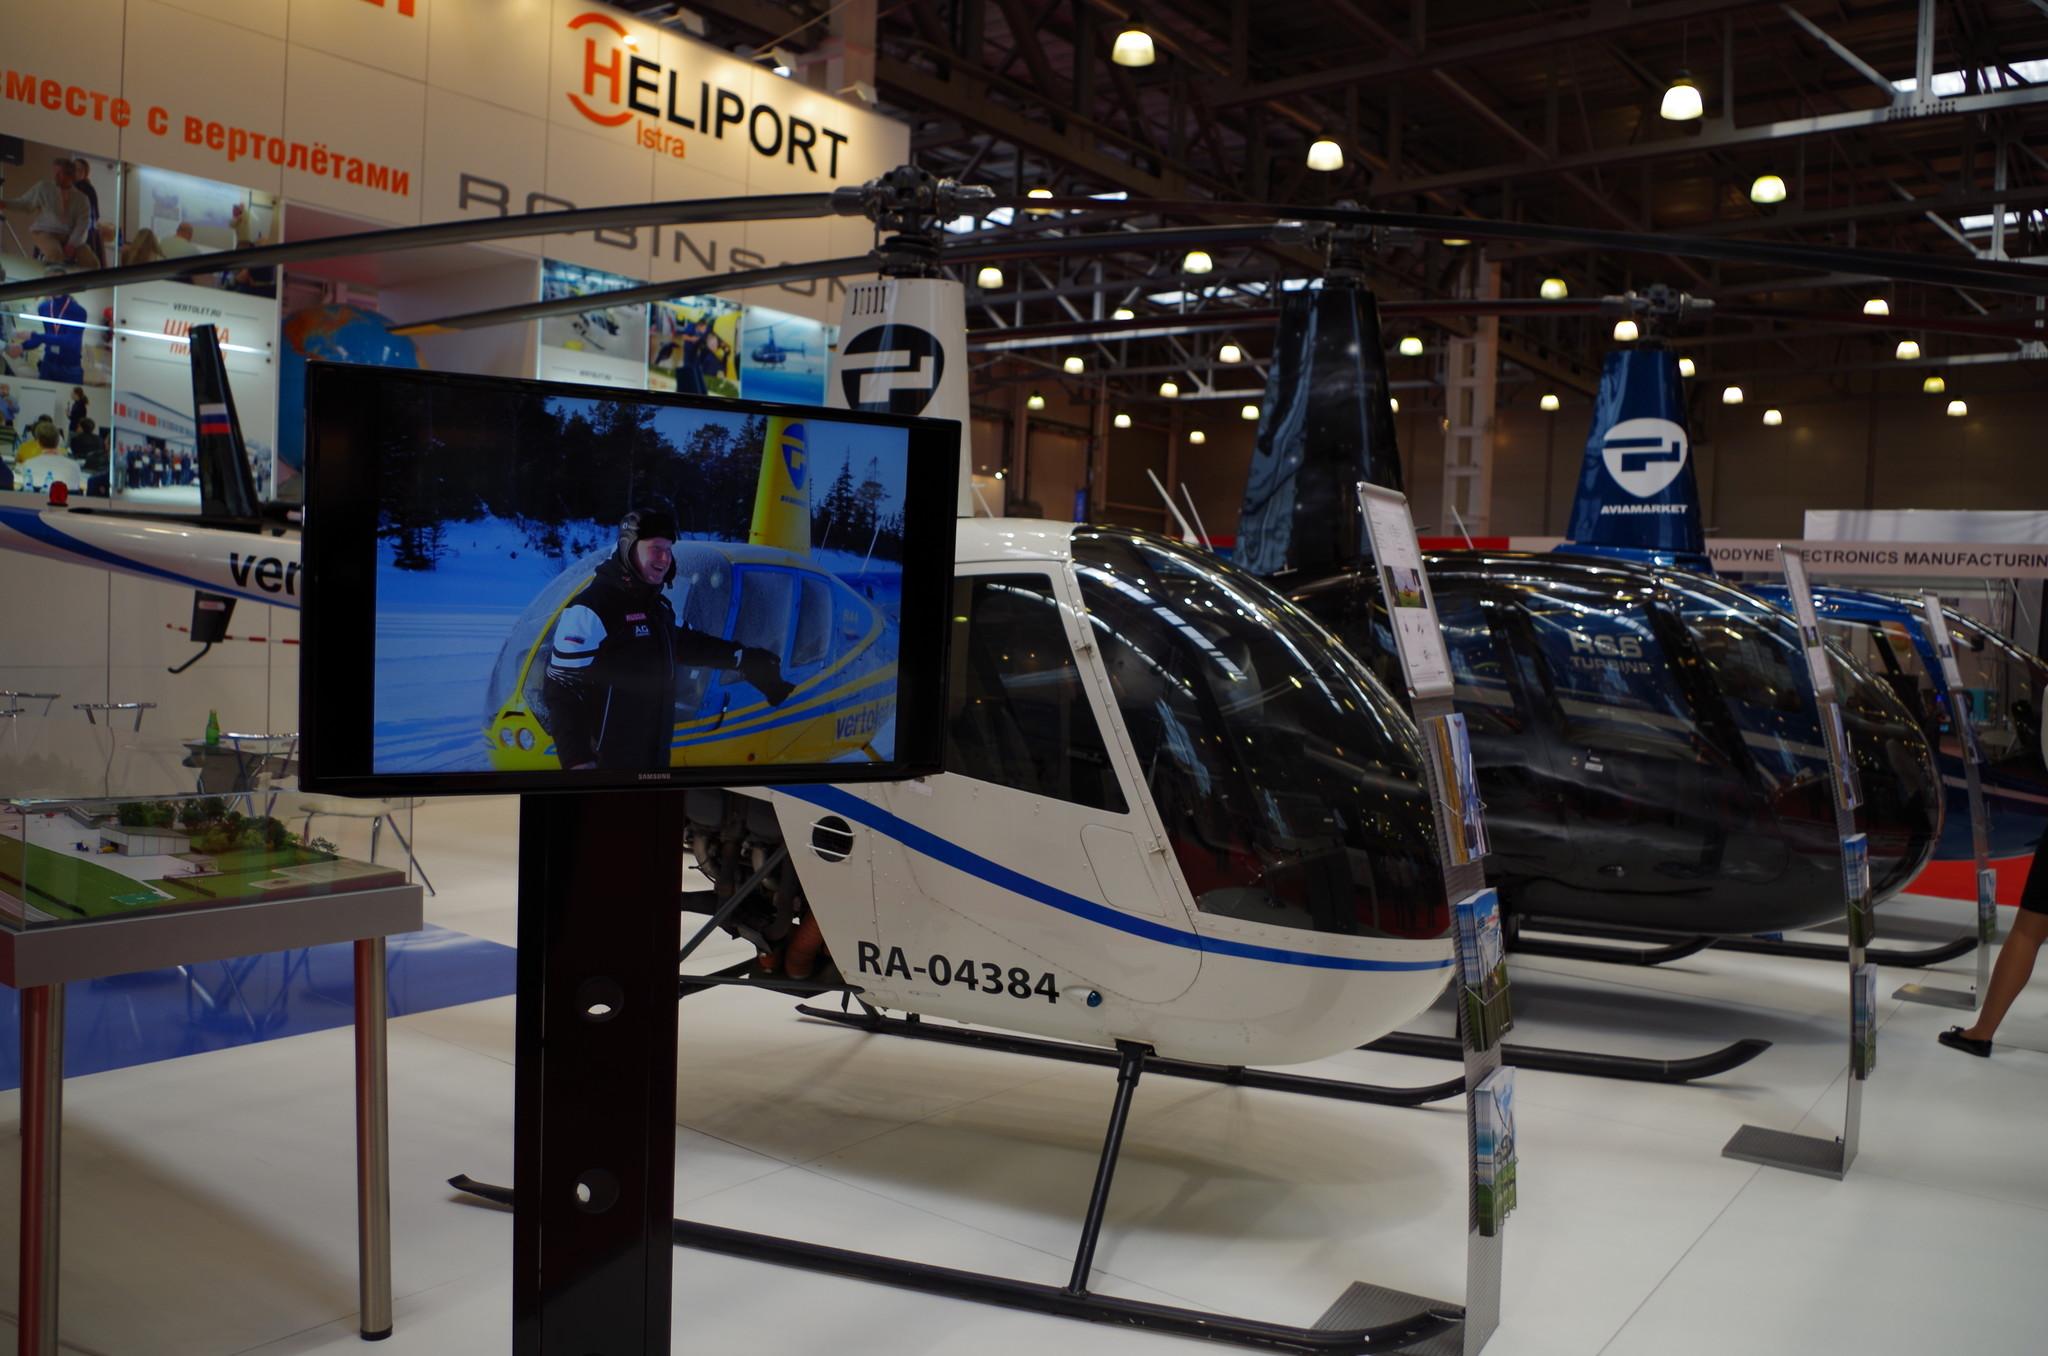 Лёгкие вертолёты Robinson R22 Beta II и Robinson R66 Turbine